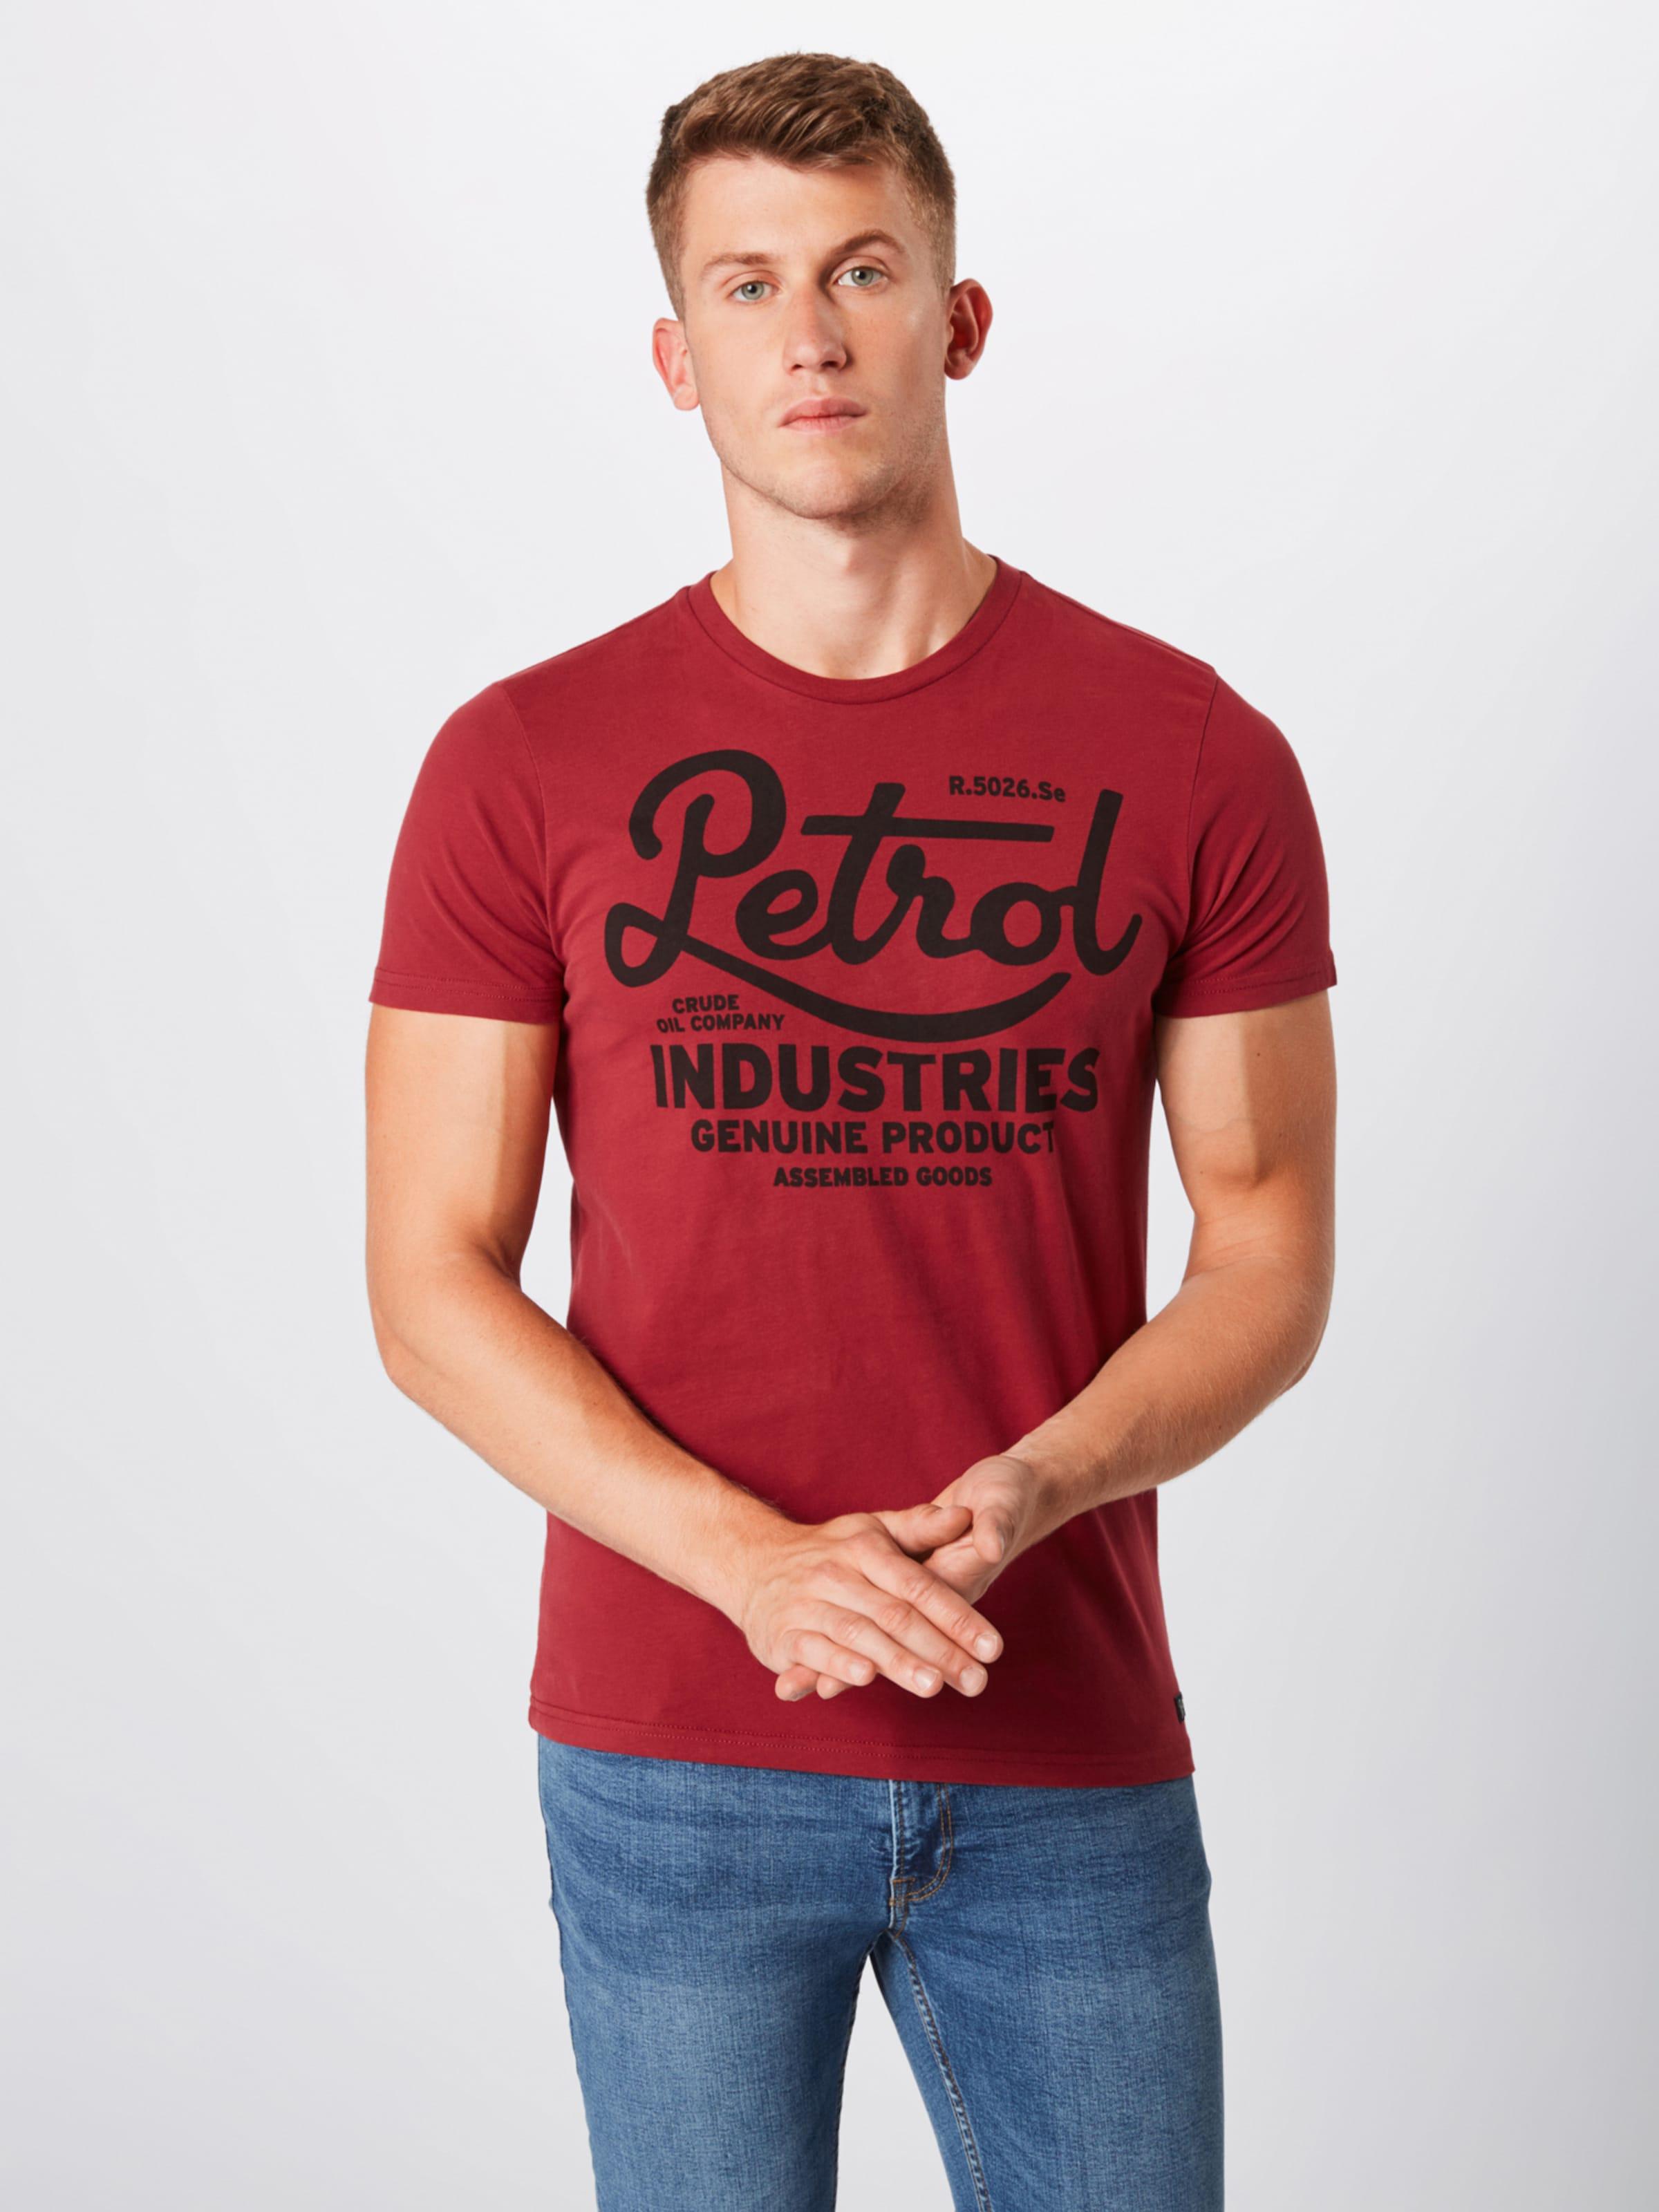 Shirt Industries Petrol Shirt RoodZwart In Industries Petrol EHID29